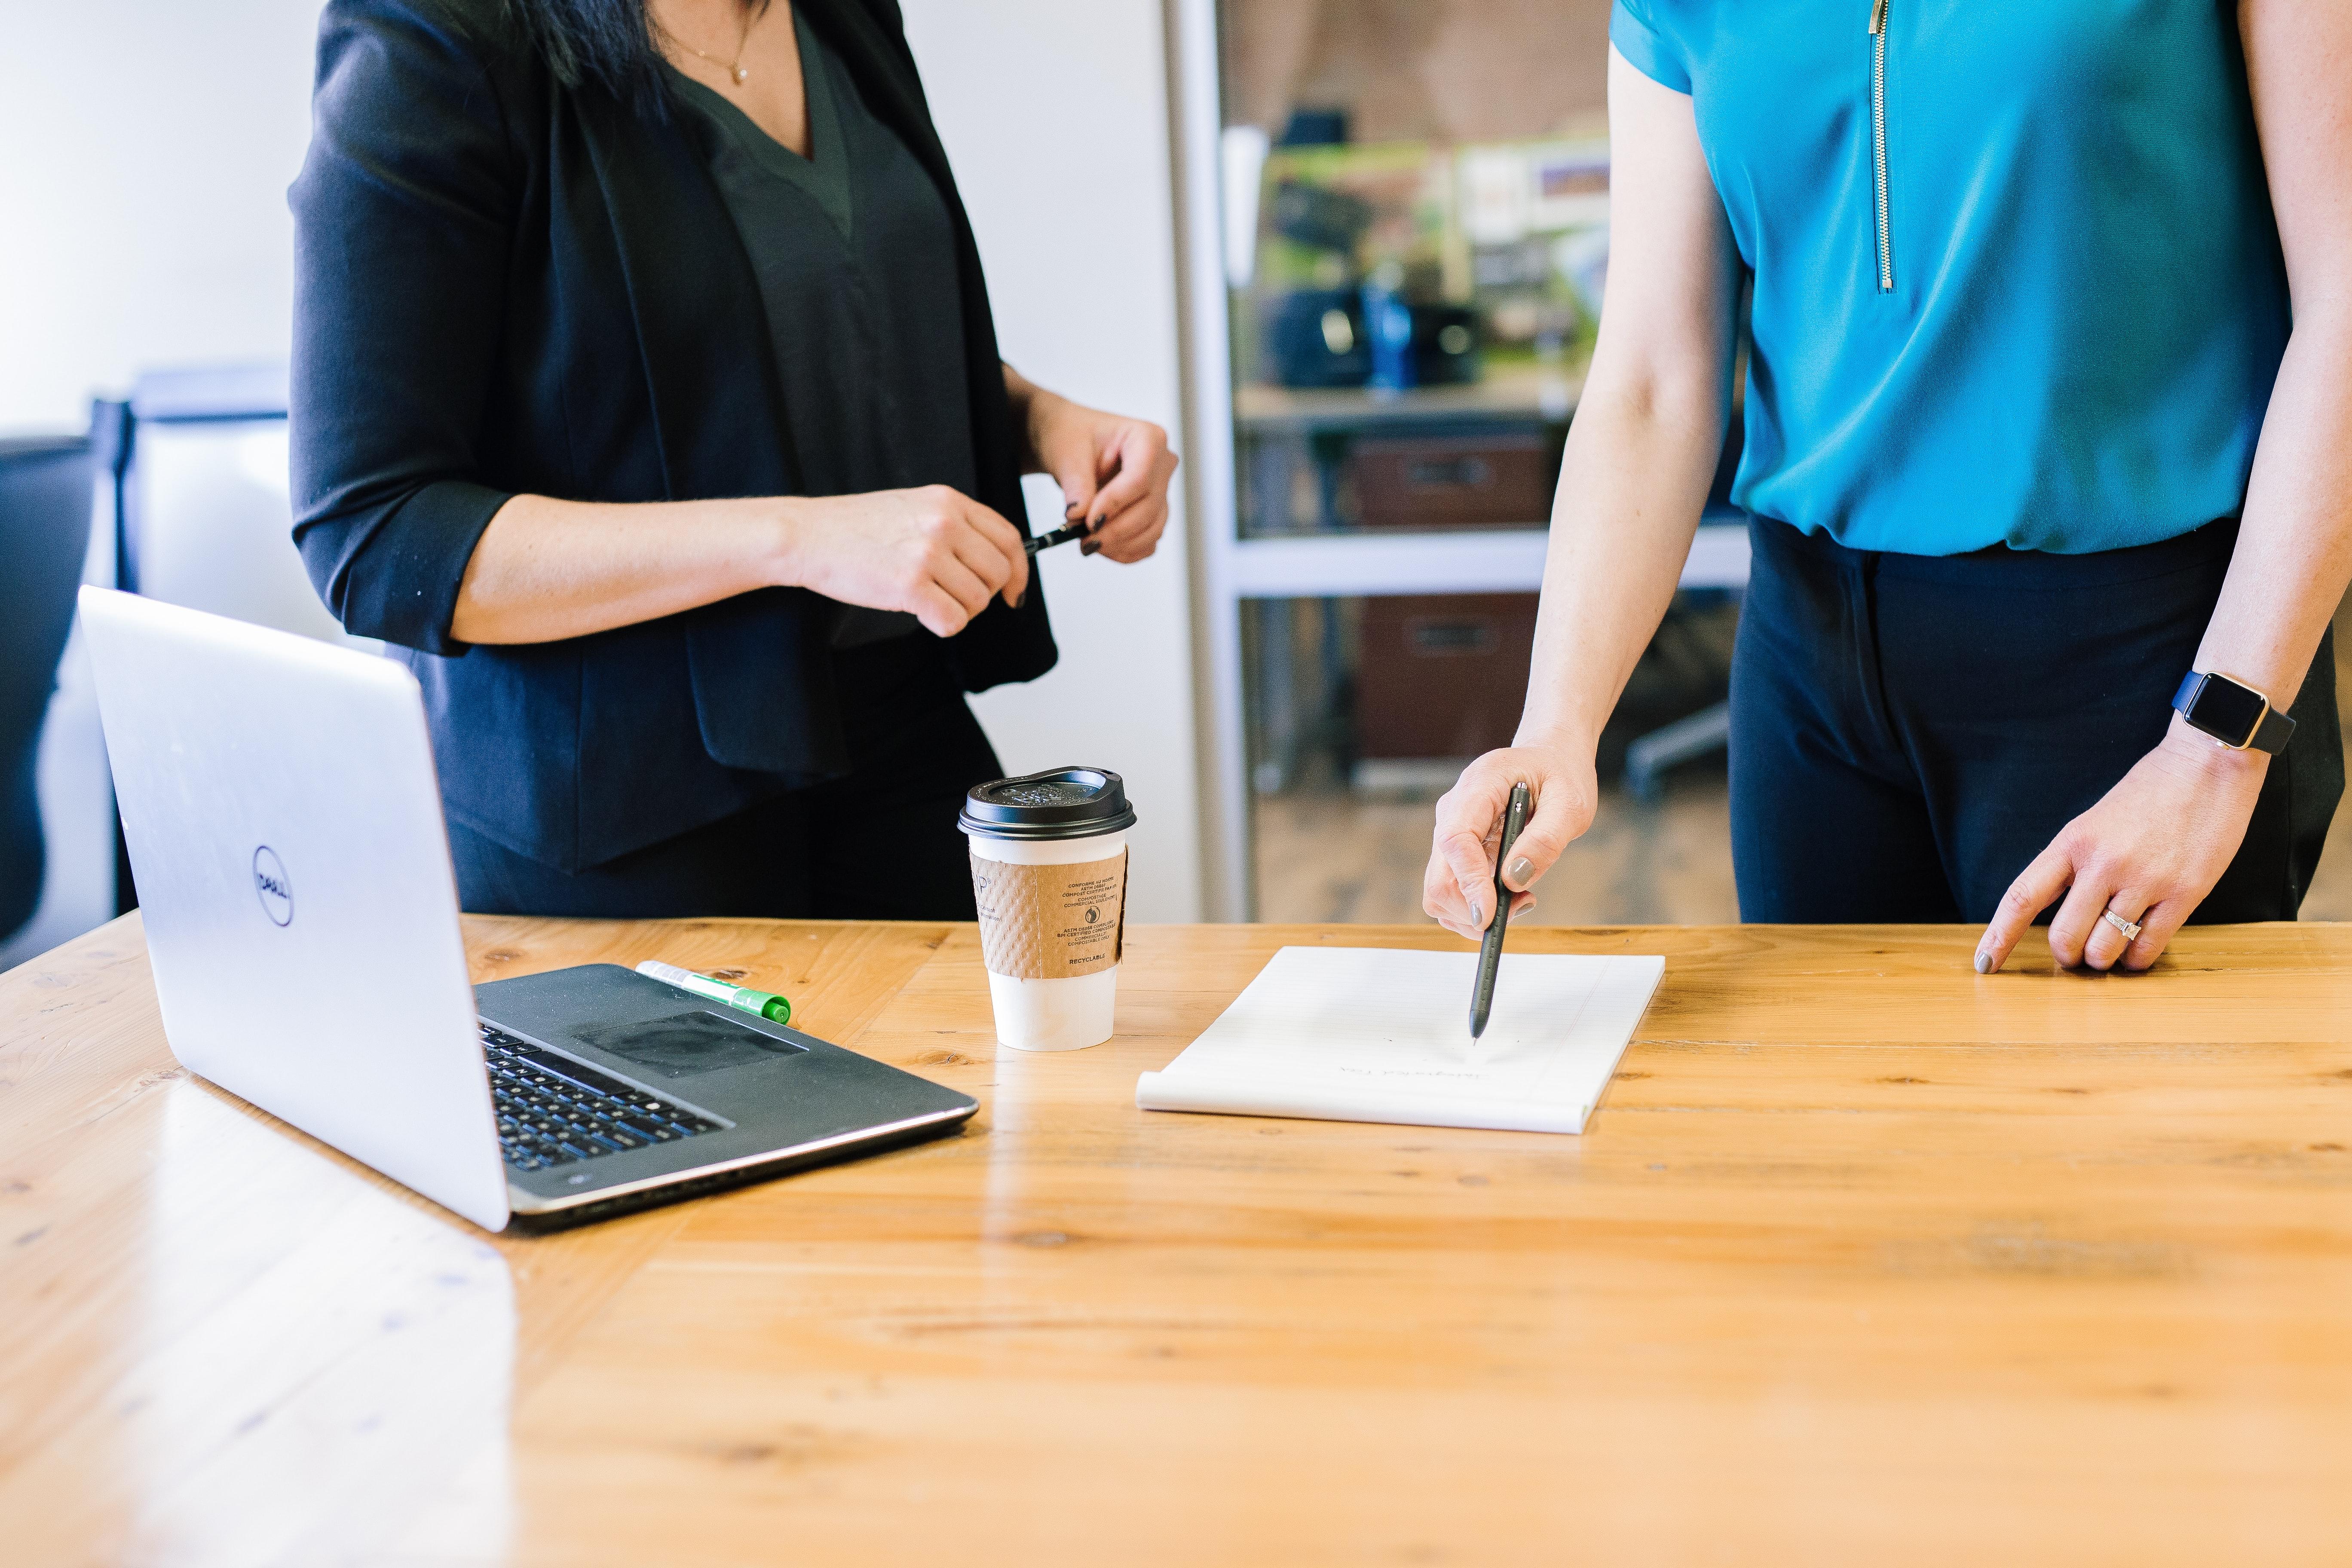 amy hirschi uwpo02K55zw unsplash - How To Start Your Online Business In 2021?